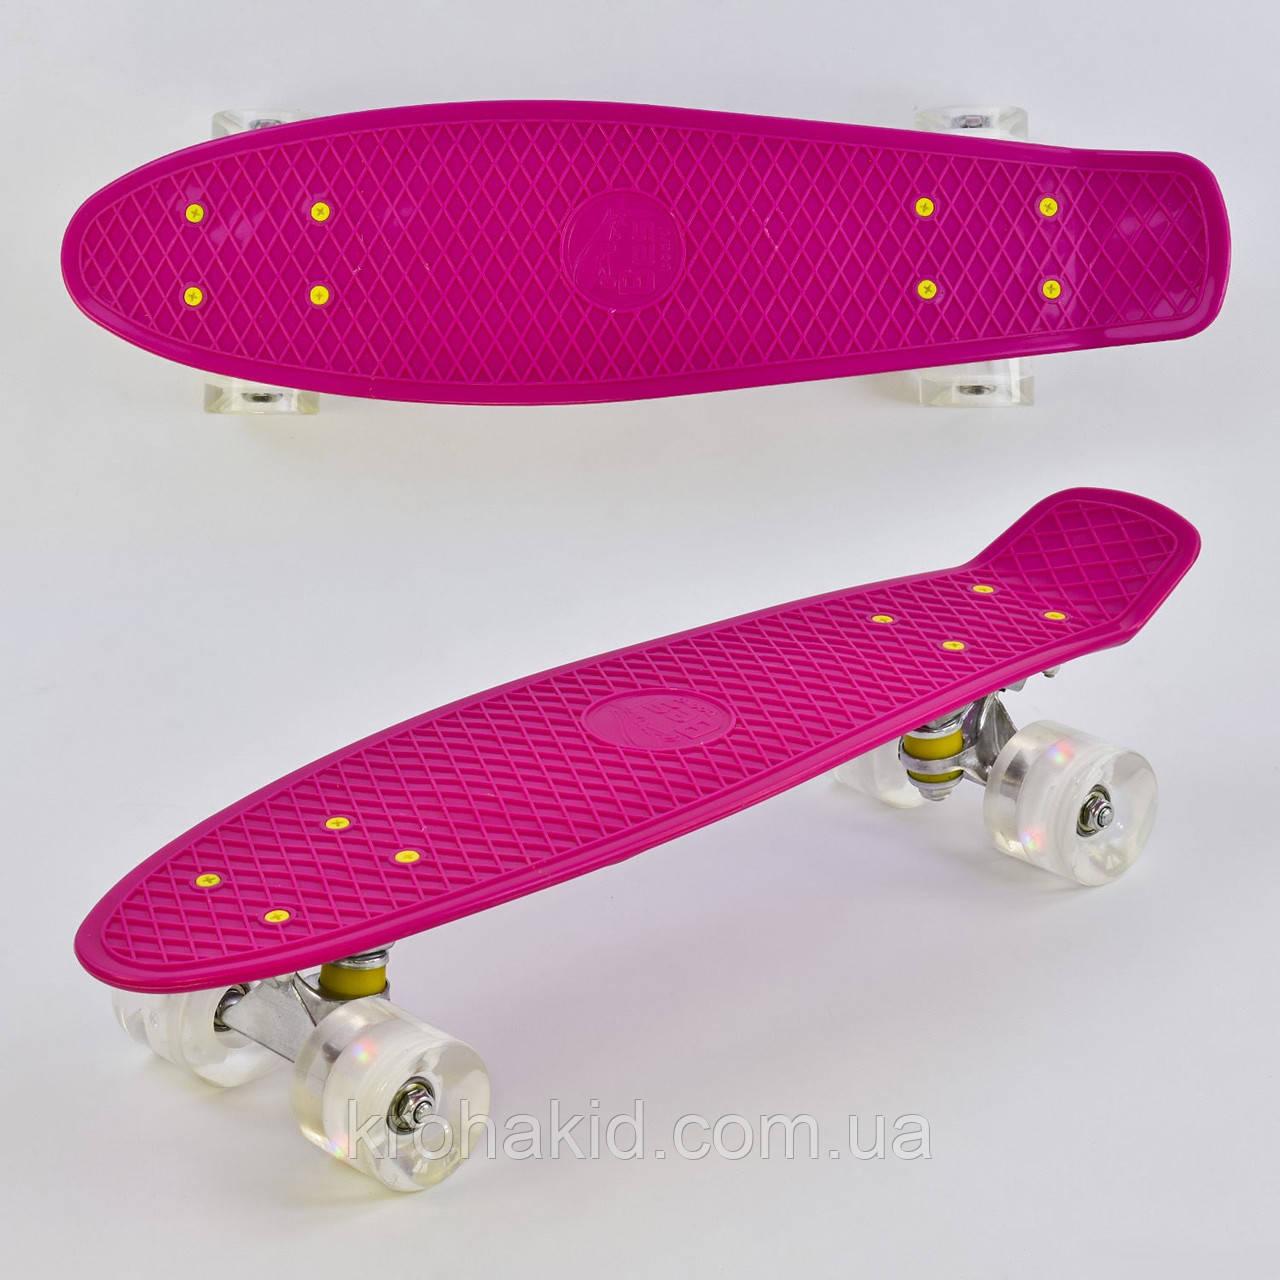 Скейт Пенни борд 9090 Best Board, доска=55см, колёса PU со светом, диаметр 6см (малиновый)